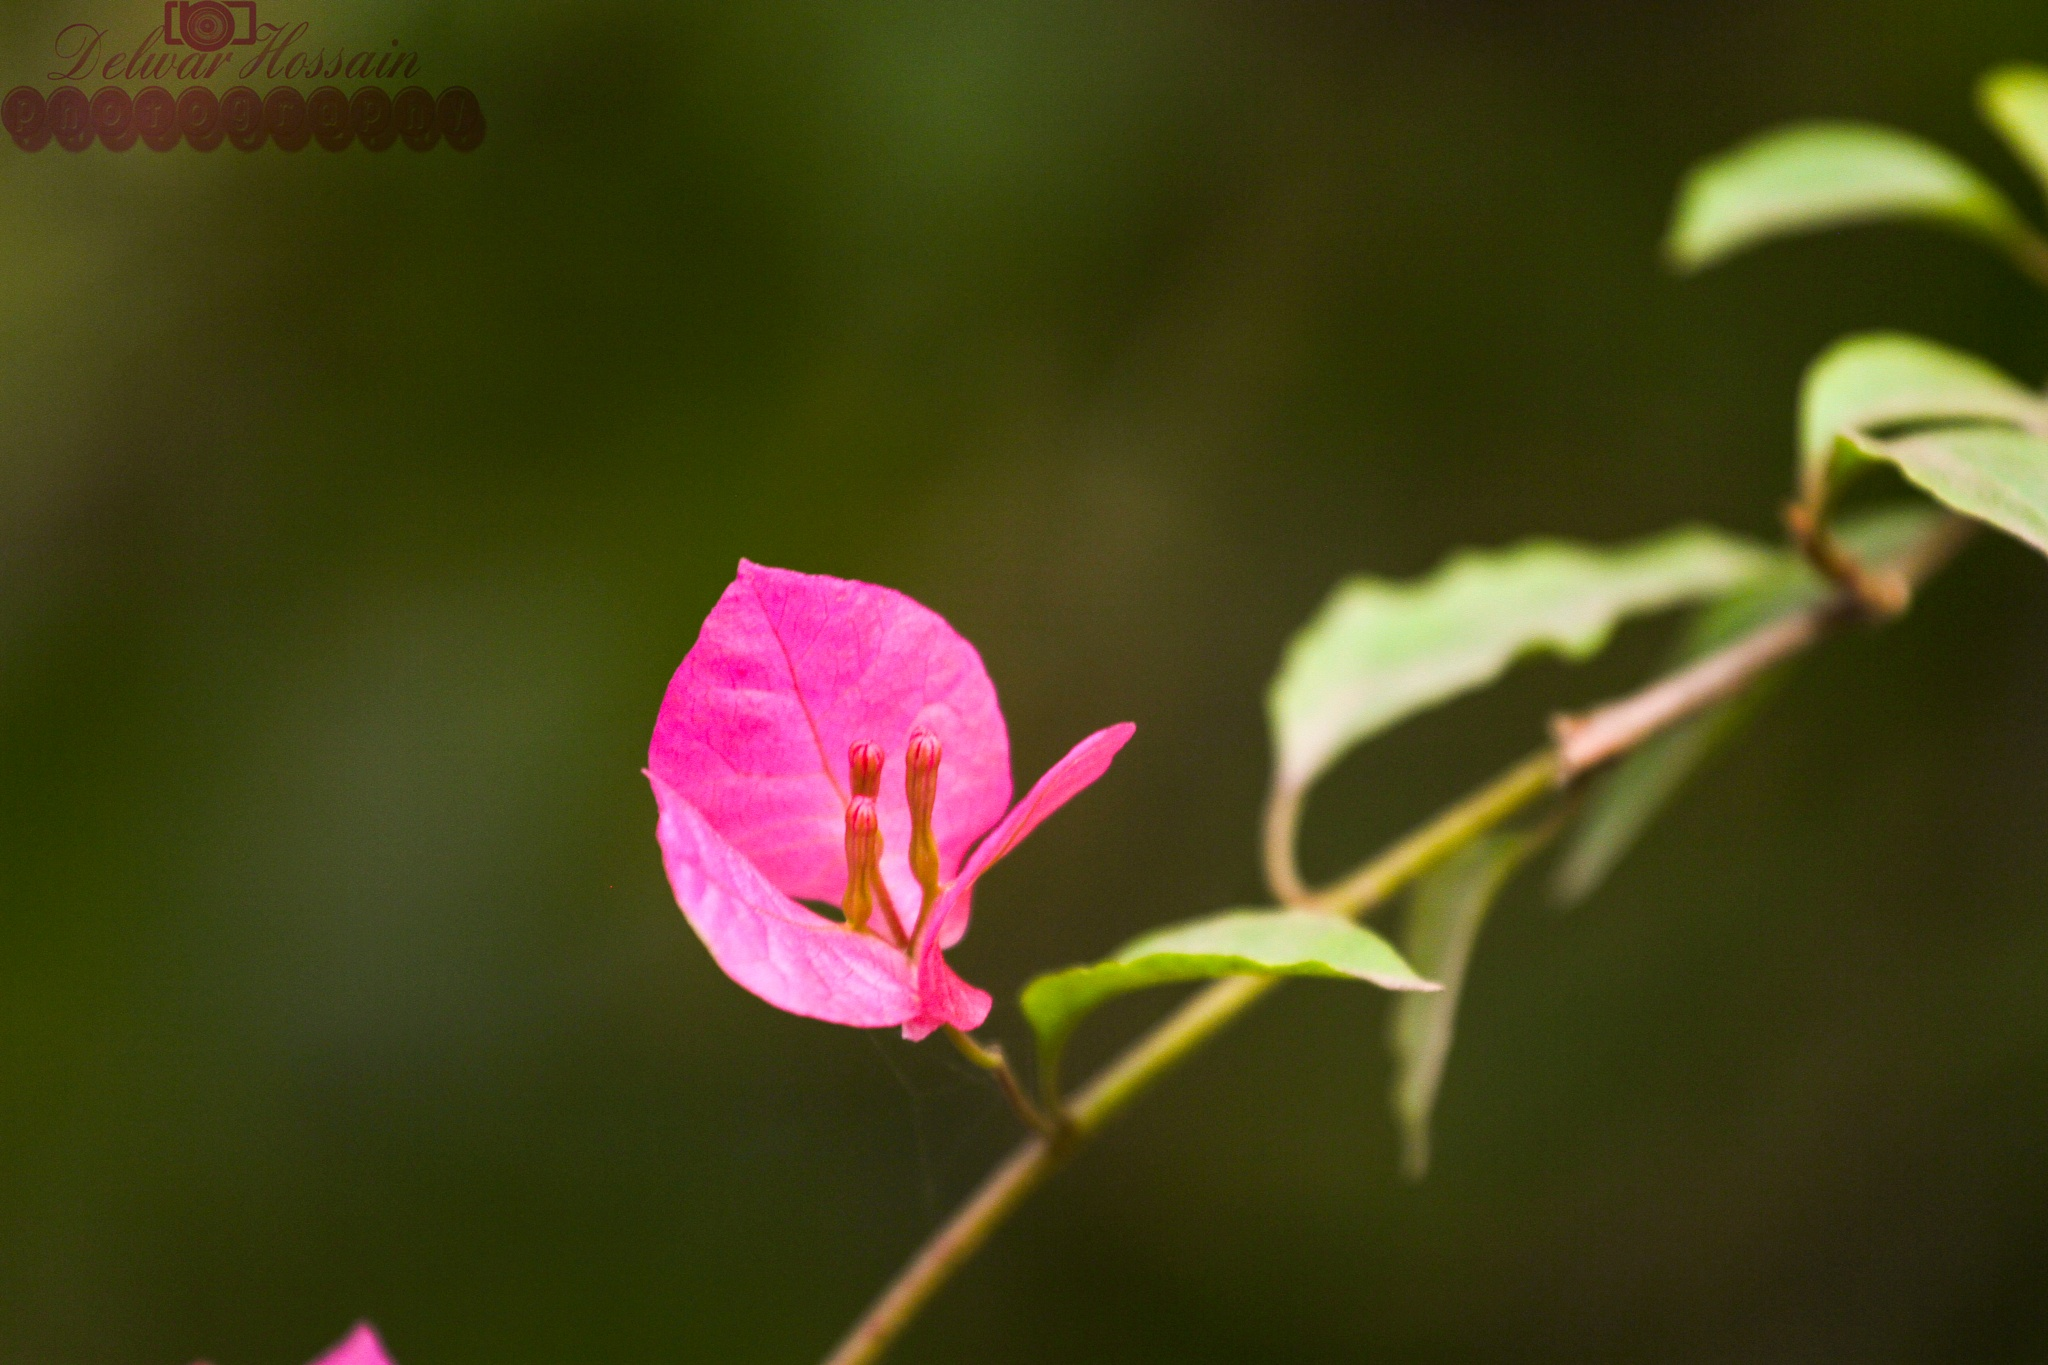 Tree leaves  by Delwar Hossain